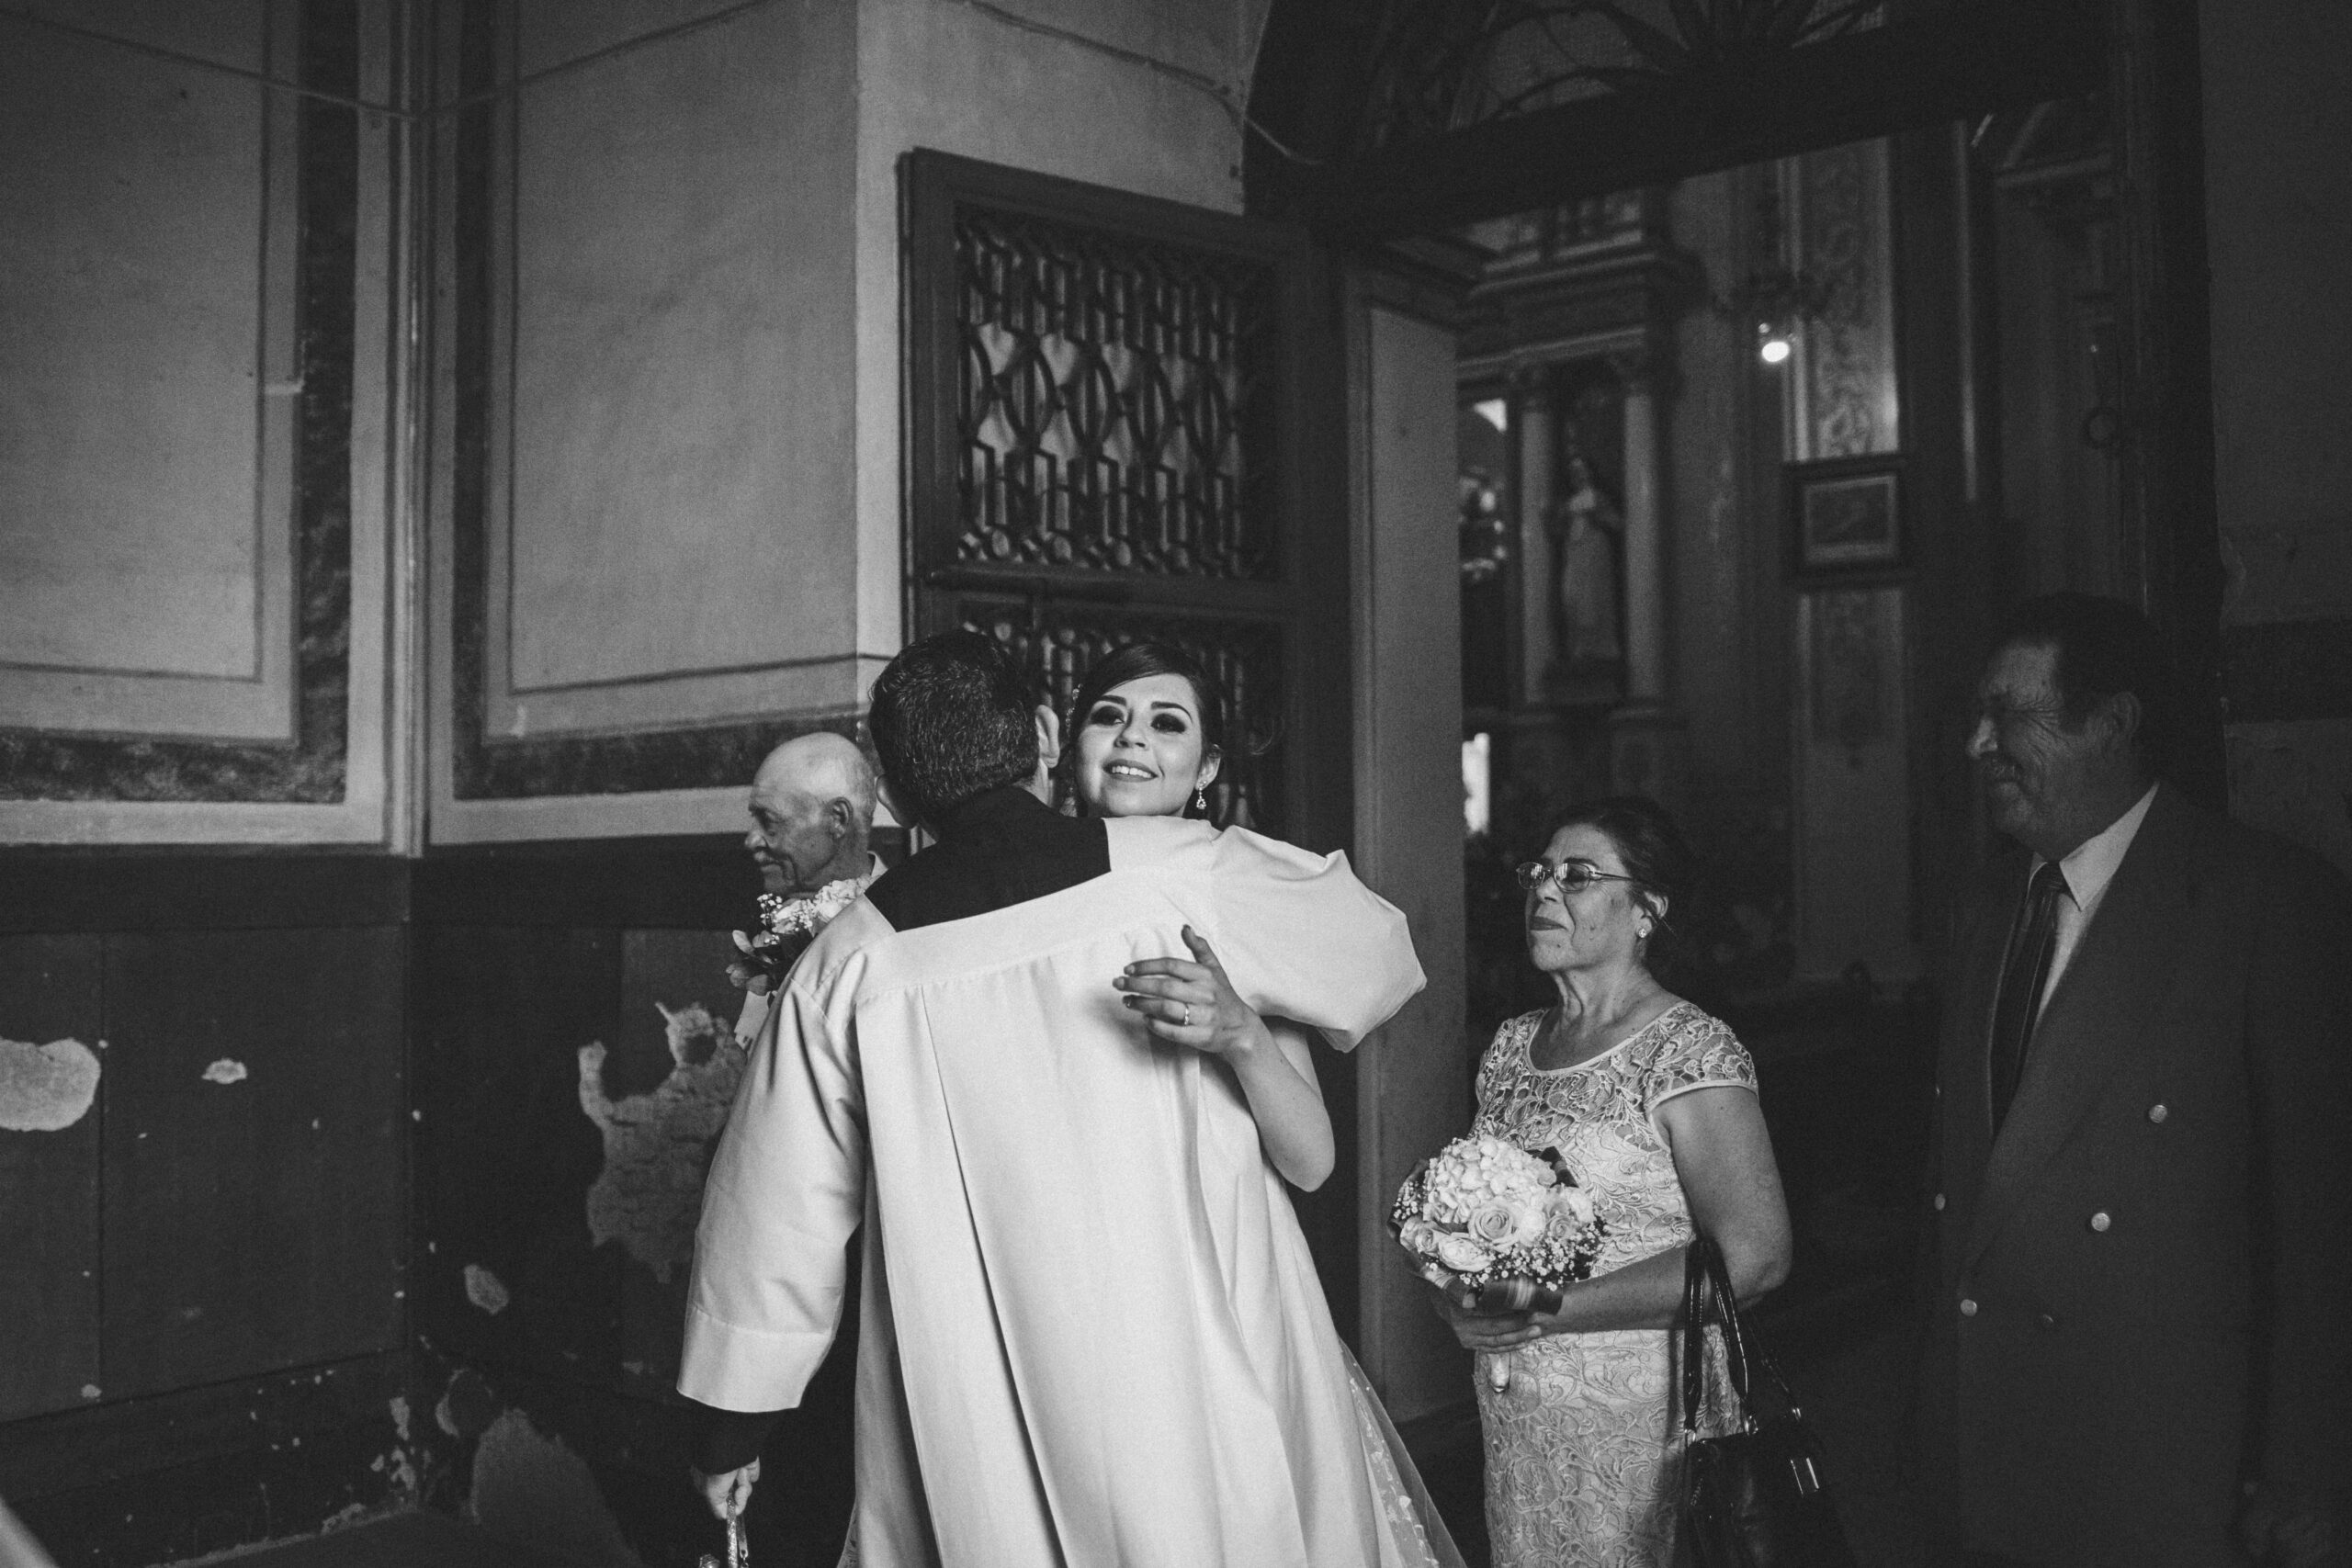 javier_noriega_fotografo_profesional_zacatecas_mexico_chihuahua_photographer9